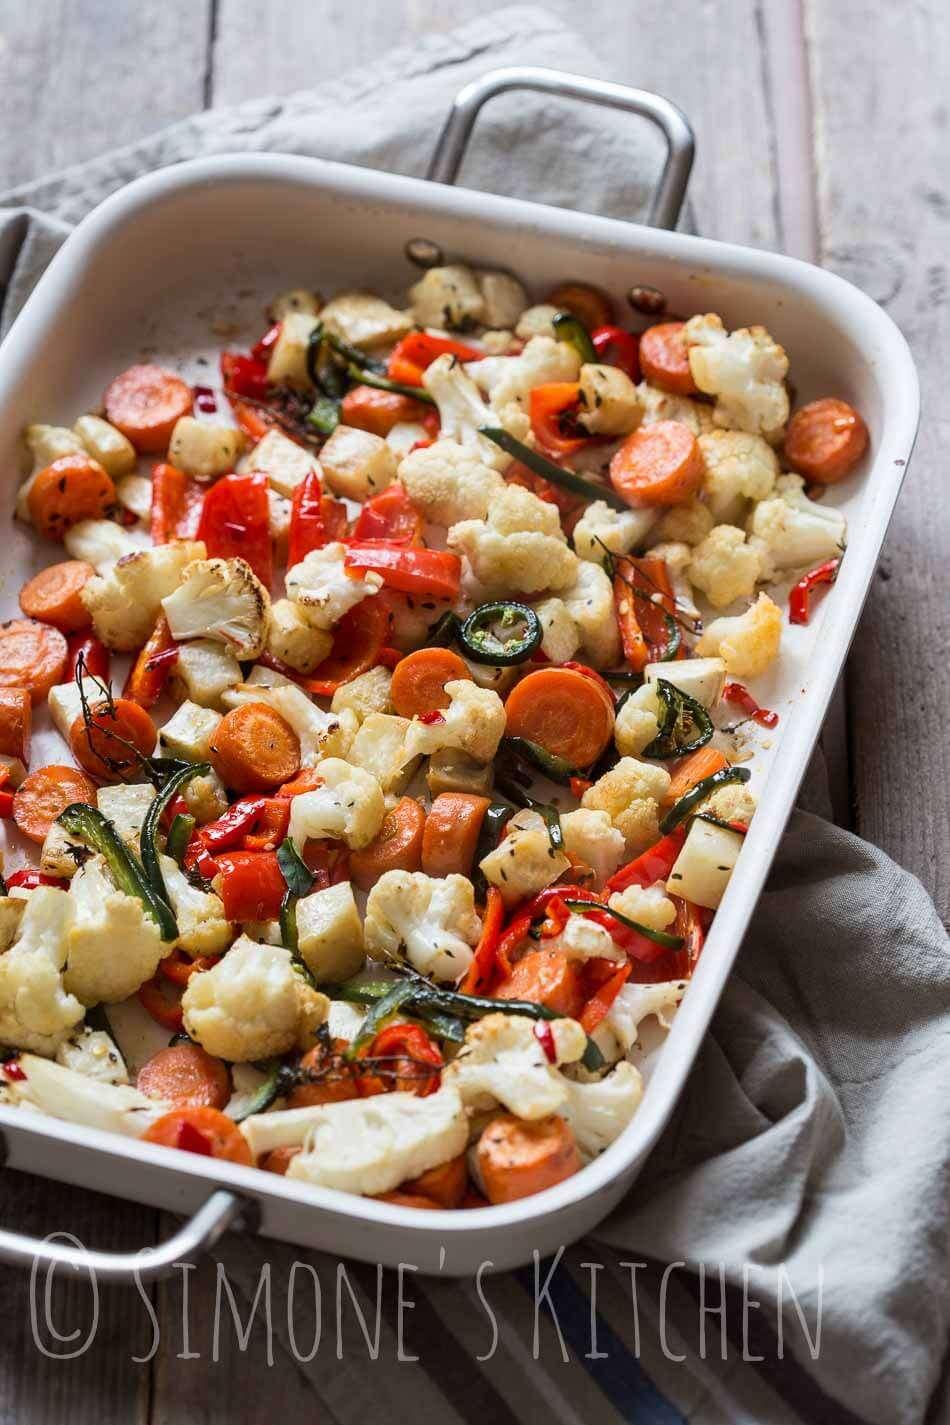 Roasted spicy vegetables   insimoneskitchen.com